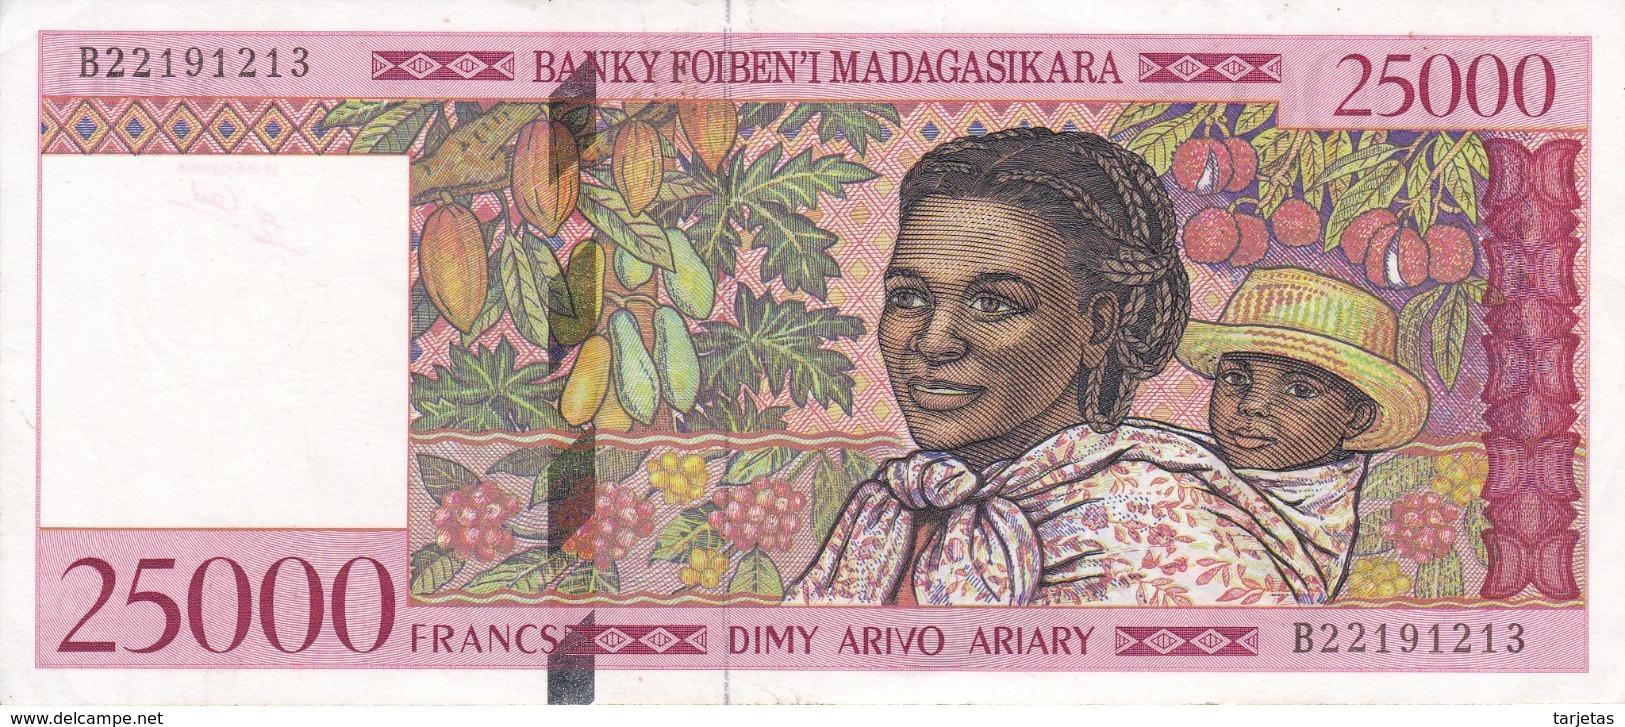 BILLETE DE MADAGASCAR DE 25000 FRANCS DEL AÑO 1998 CALIDAD EBC (XF) (BANKNOTE) LEMUR - Madagascar